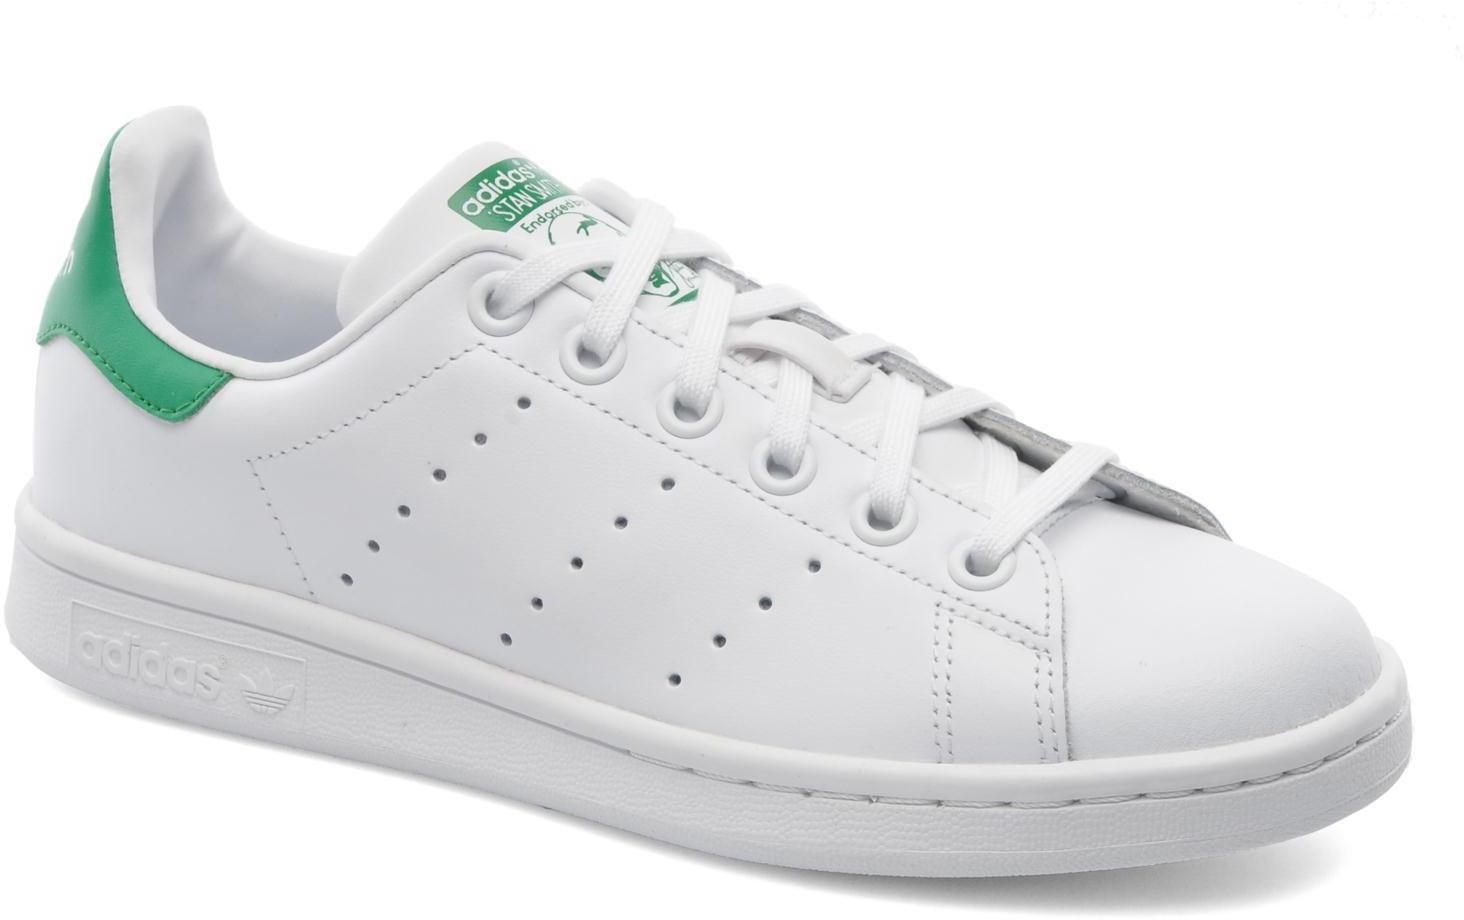 official photos 8784c a87f6 Adidas Stan Smith K white white green günstig kaufen